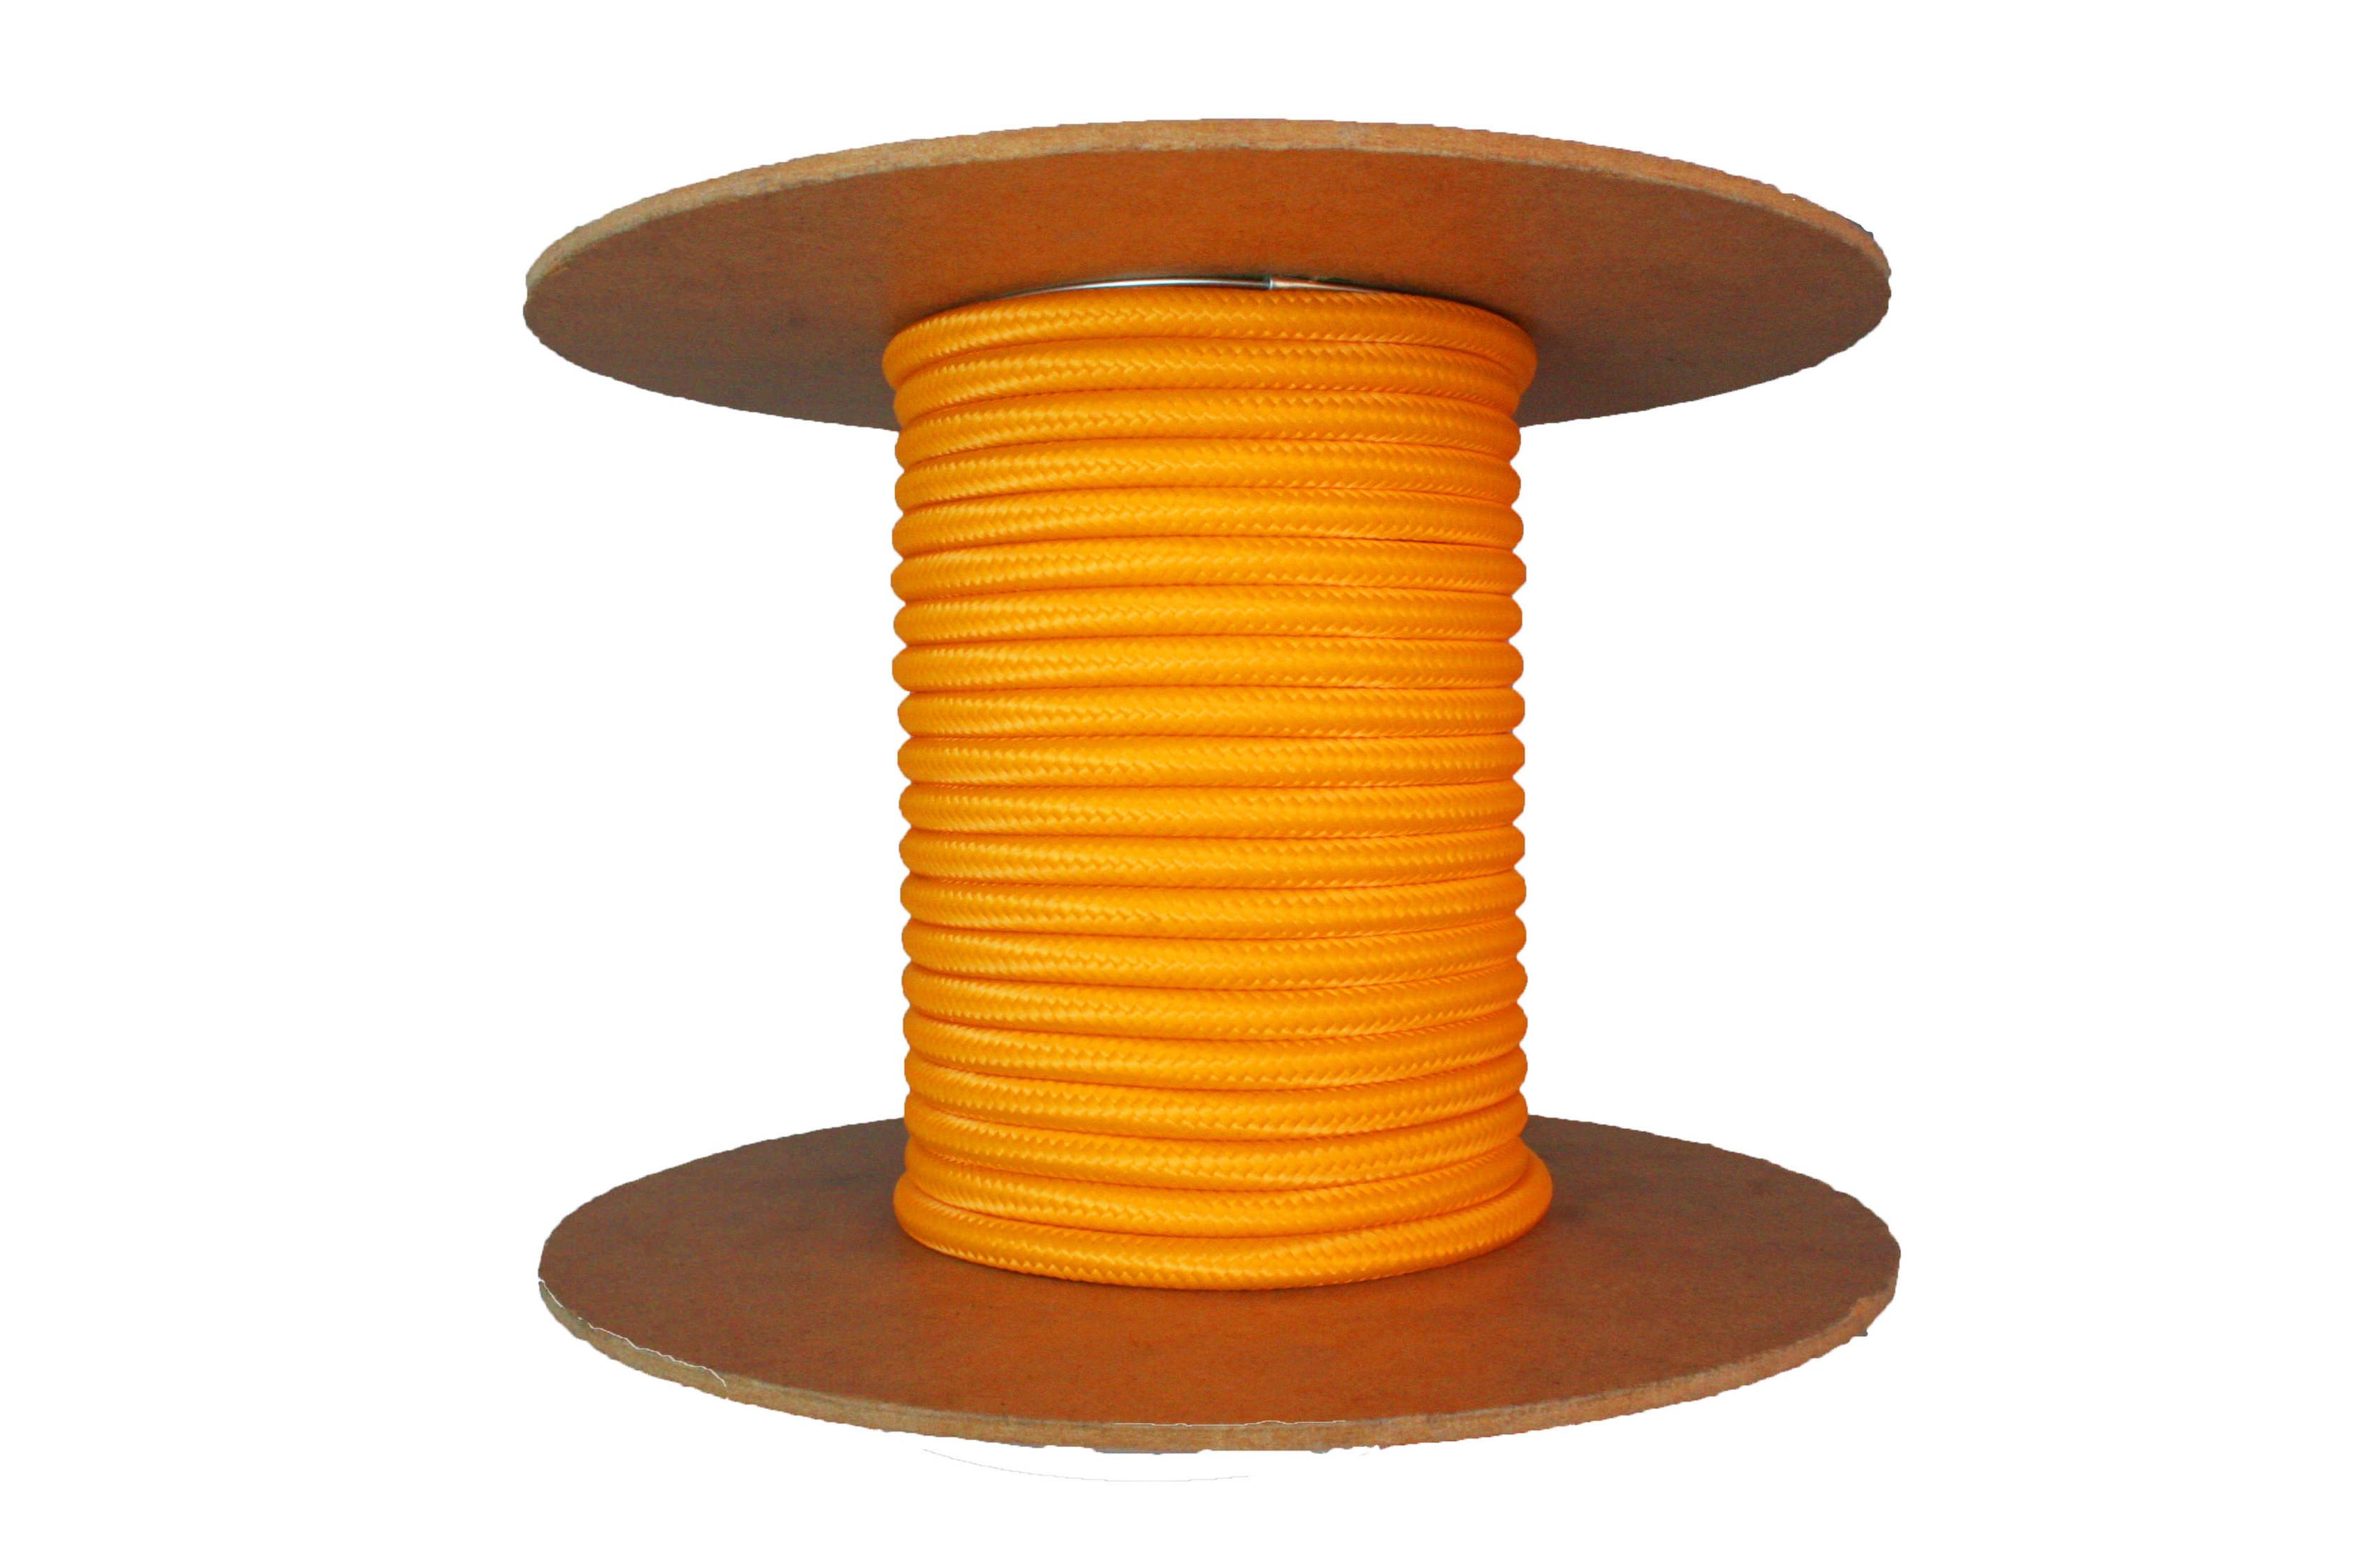 Oplot na kablach GL34